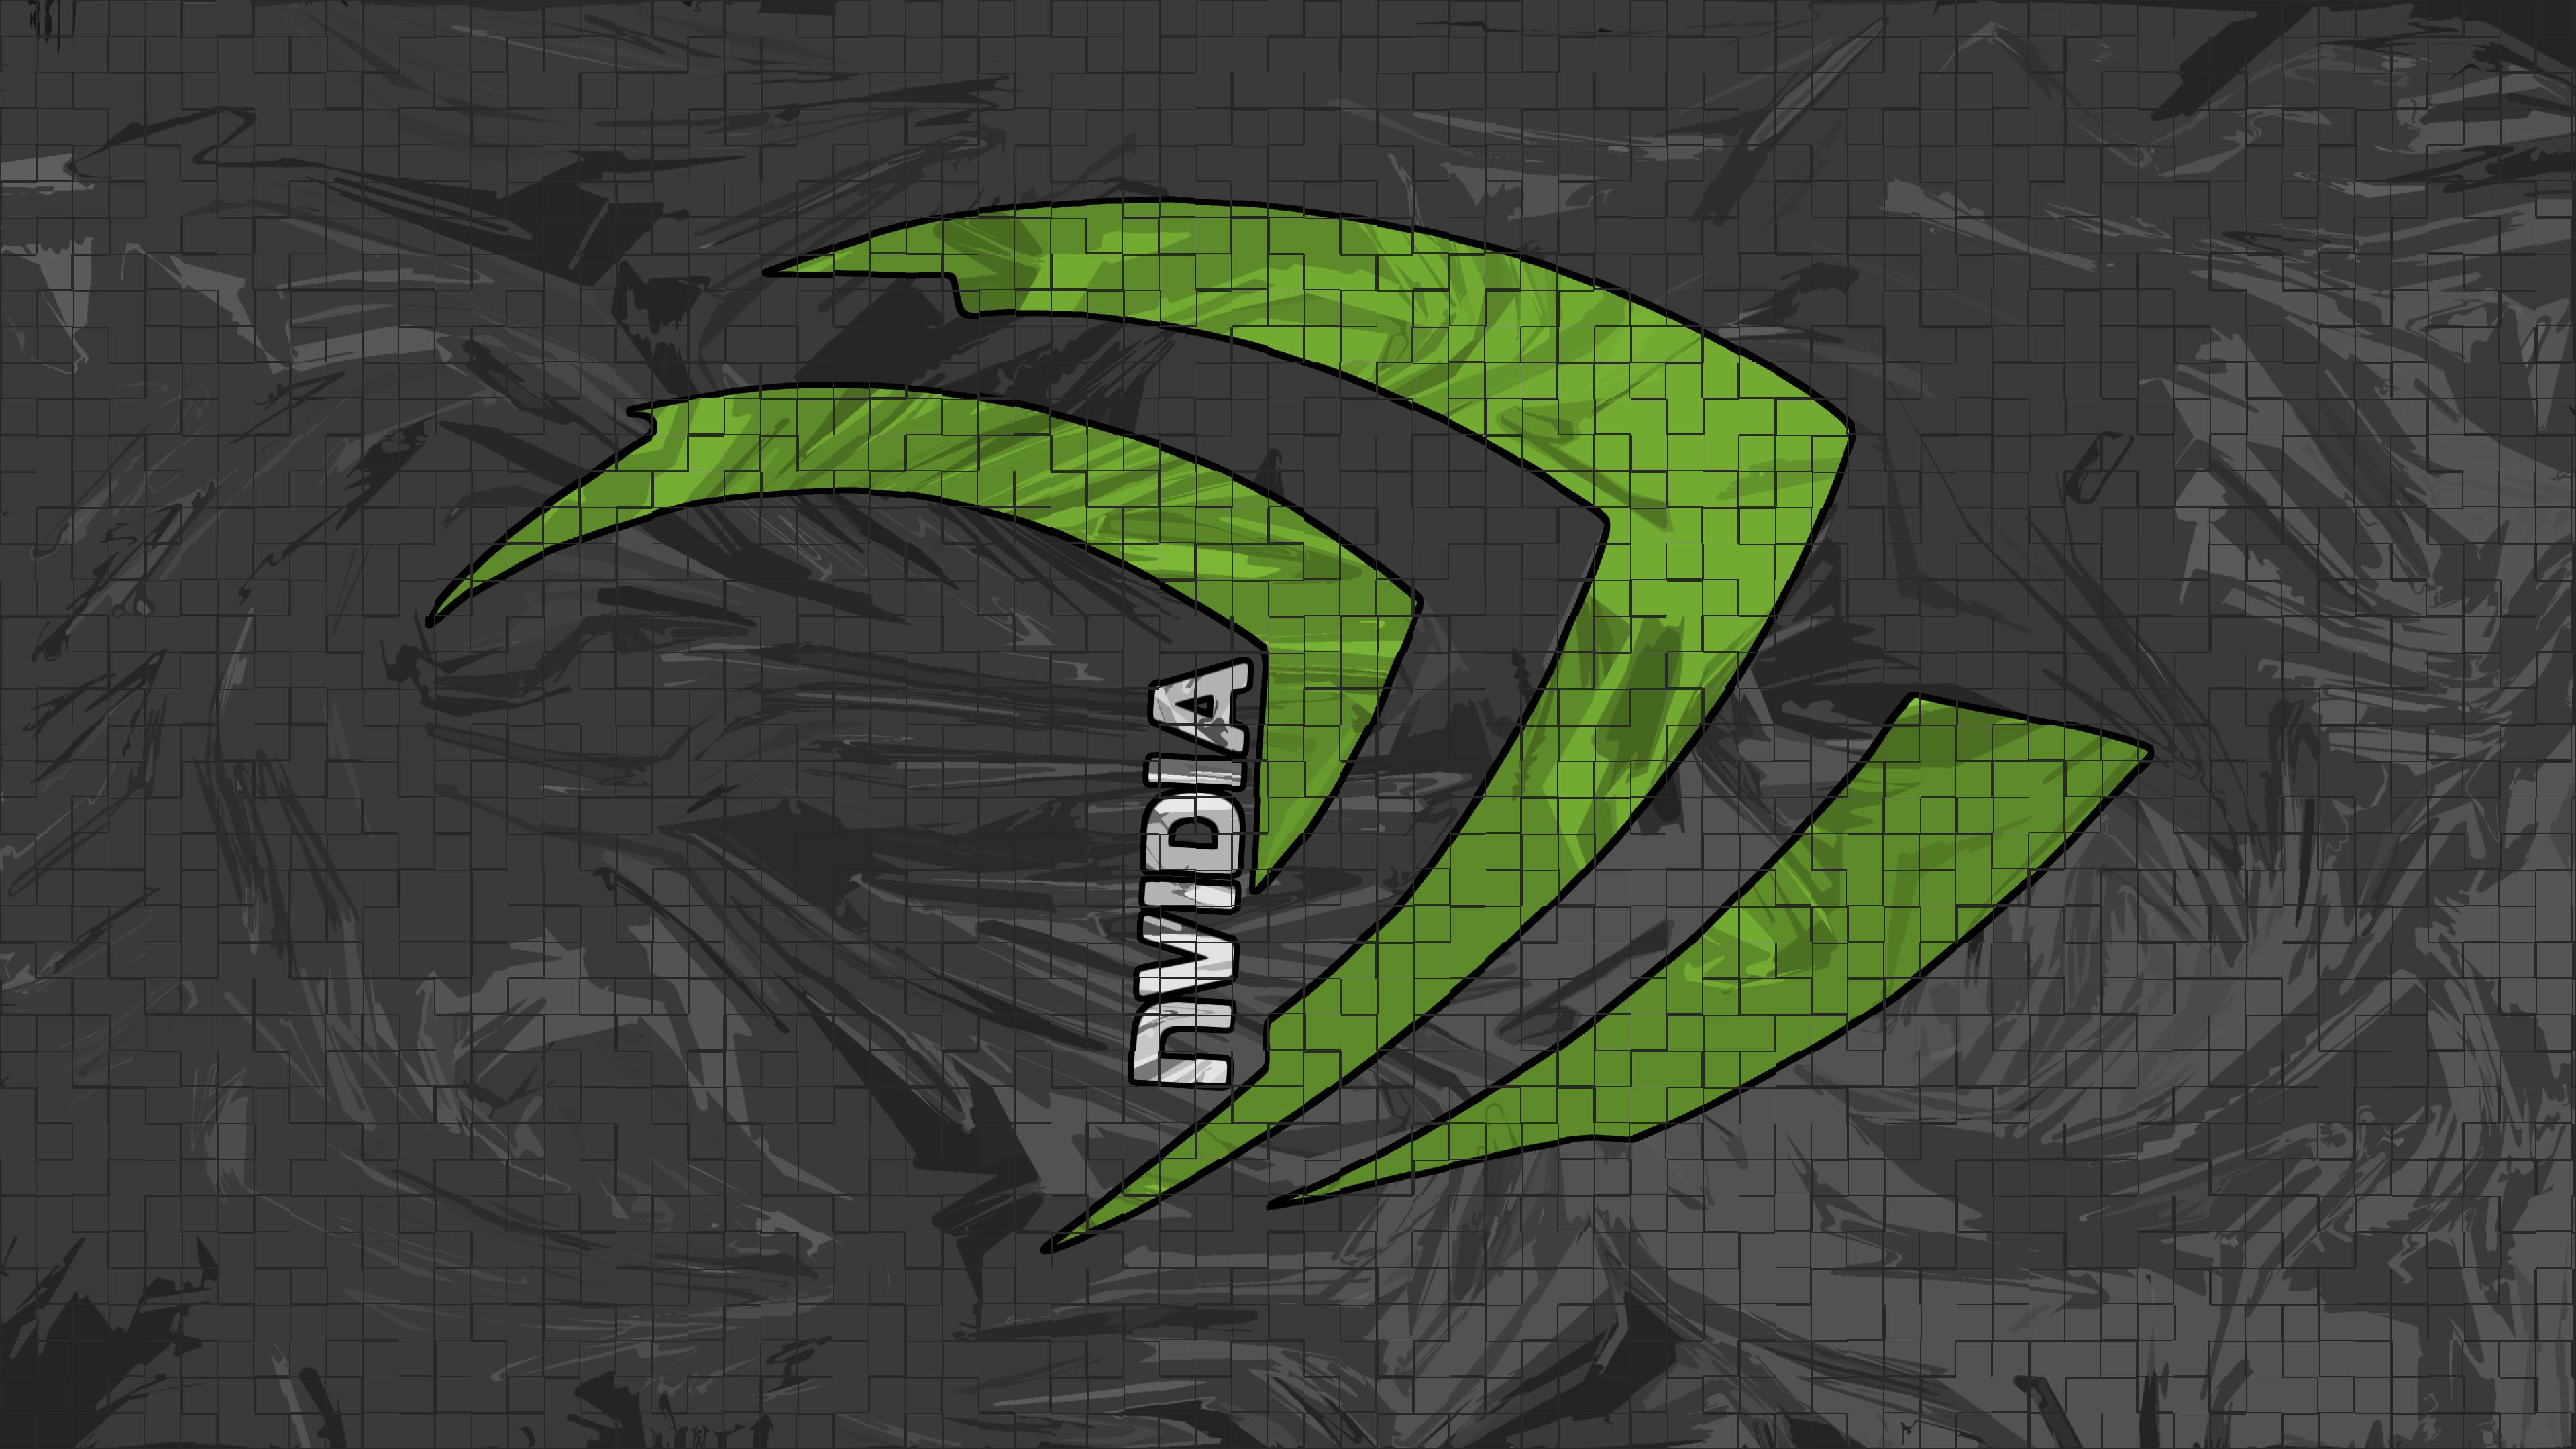 … Nvidia 4K Chaos Grid Wallpaper by RV770